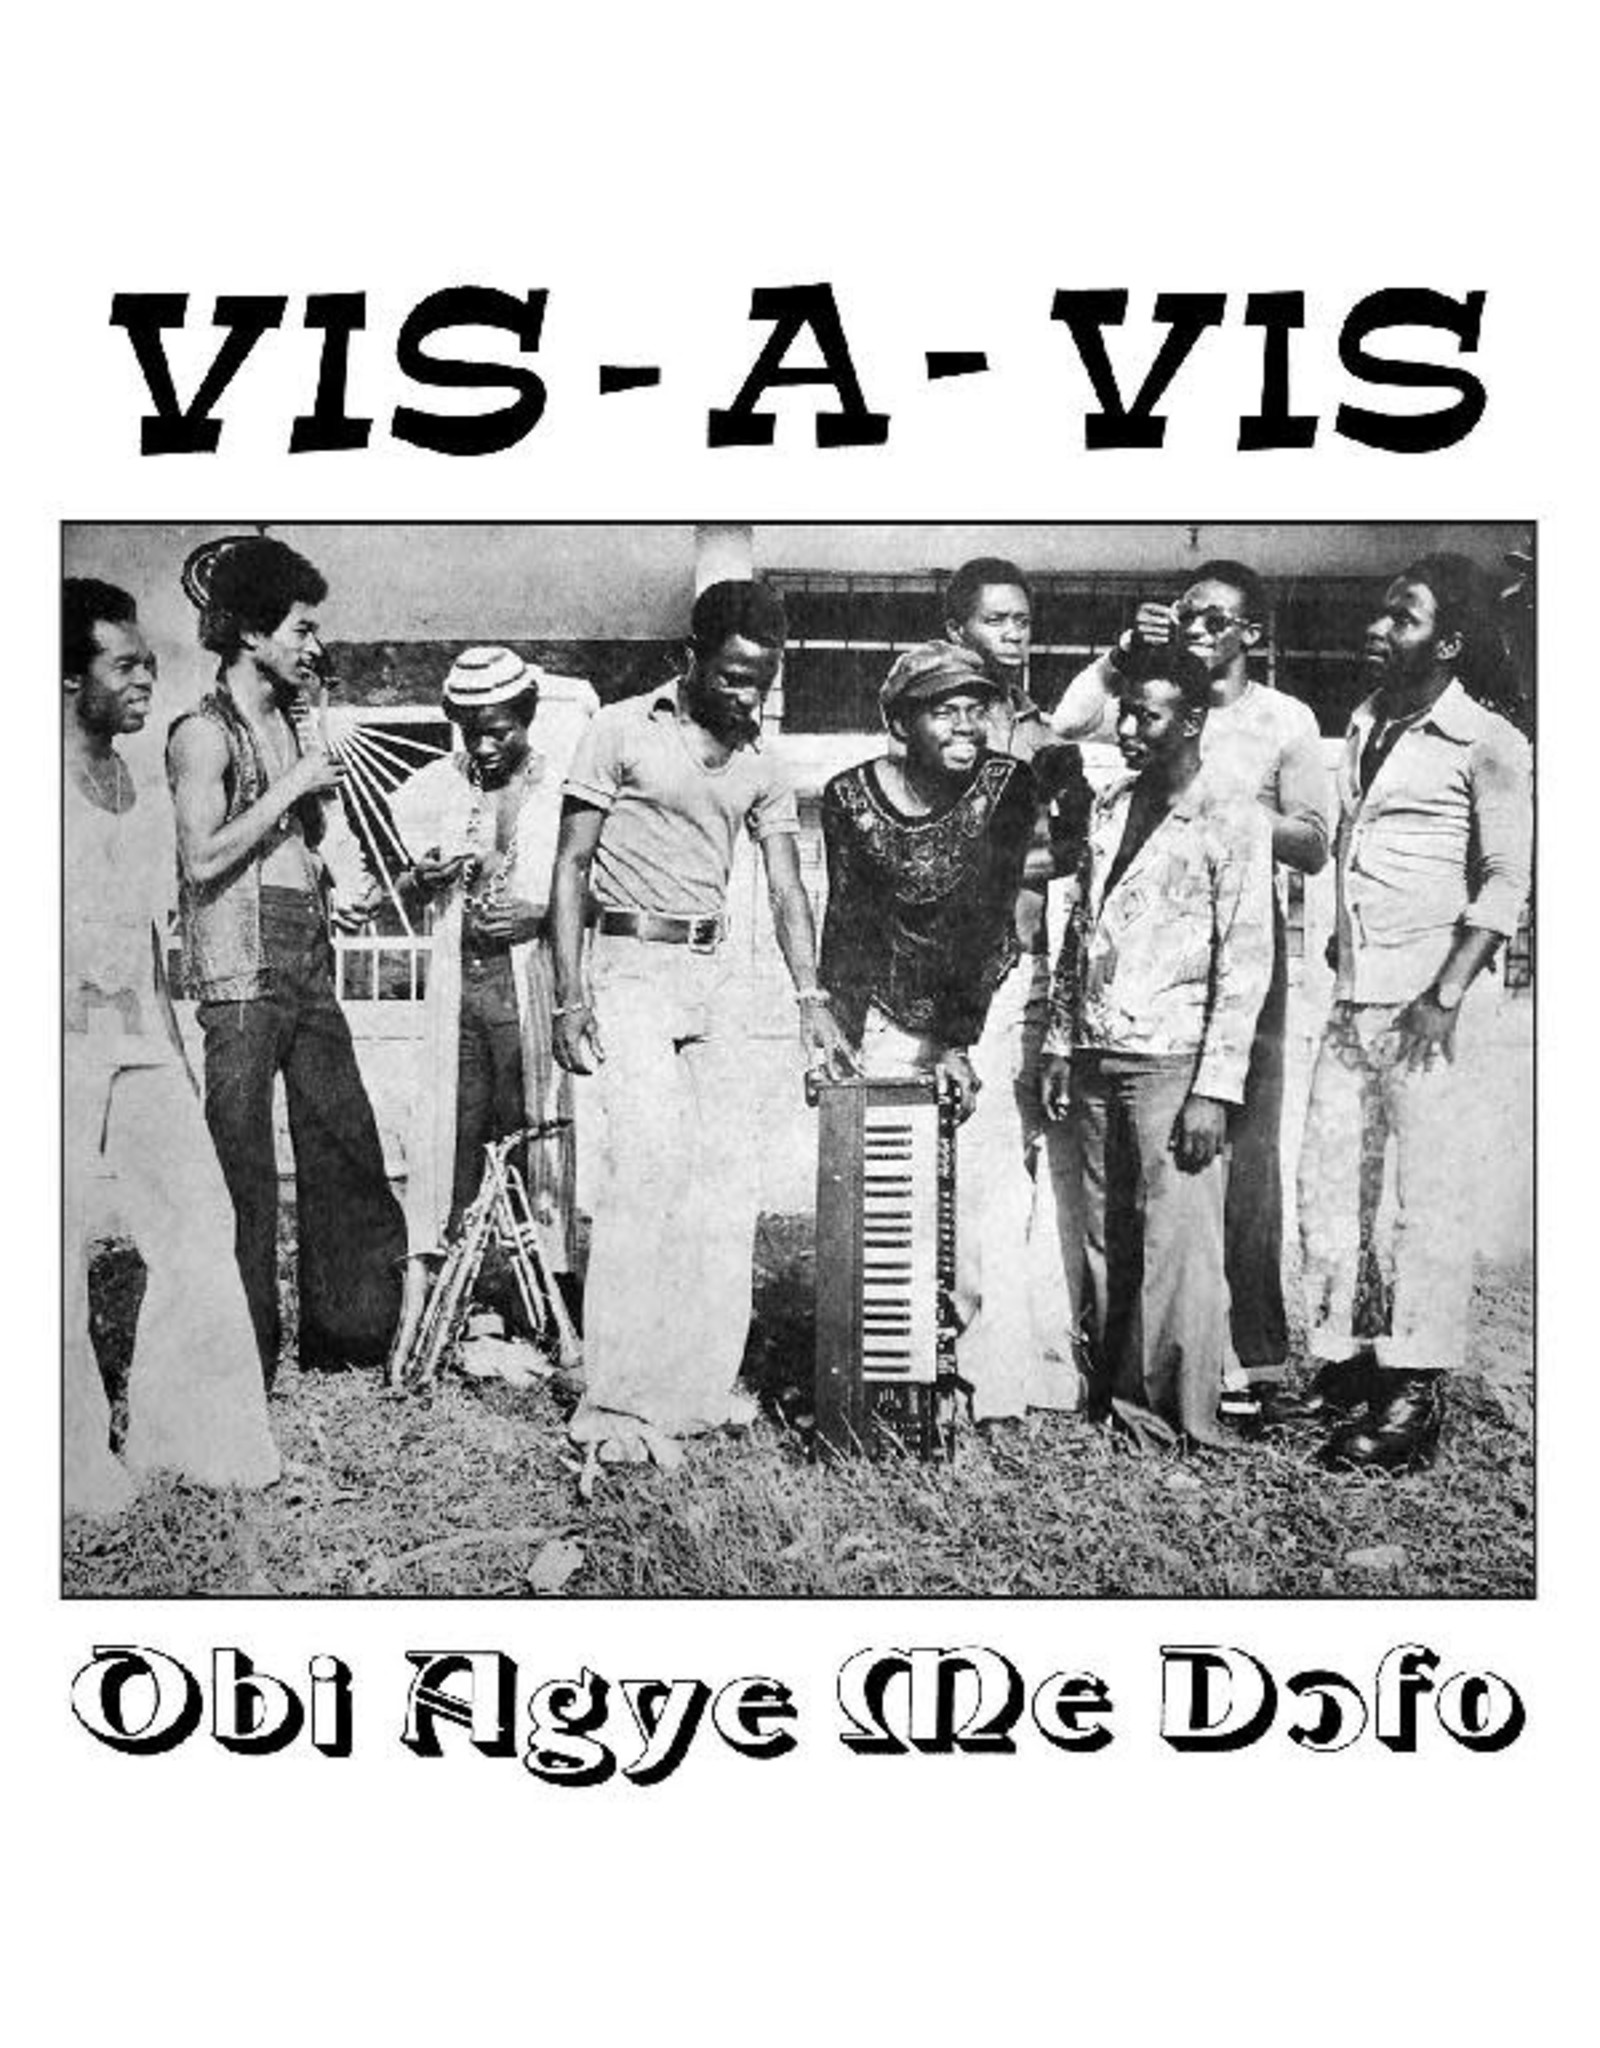 New Vinyl Vis-A-Vis - Obi Agye Me Dofo LP